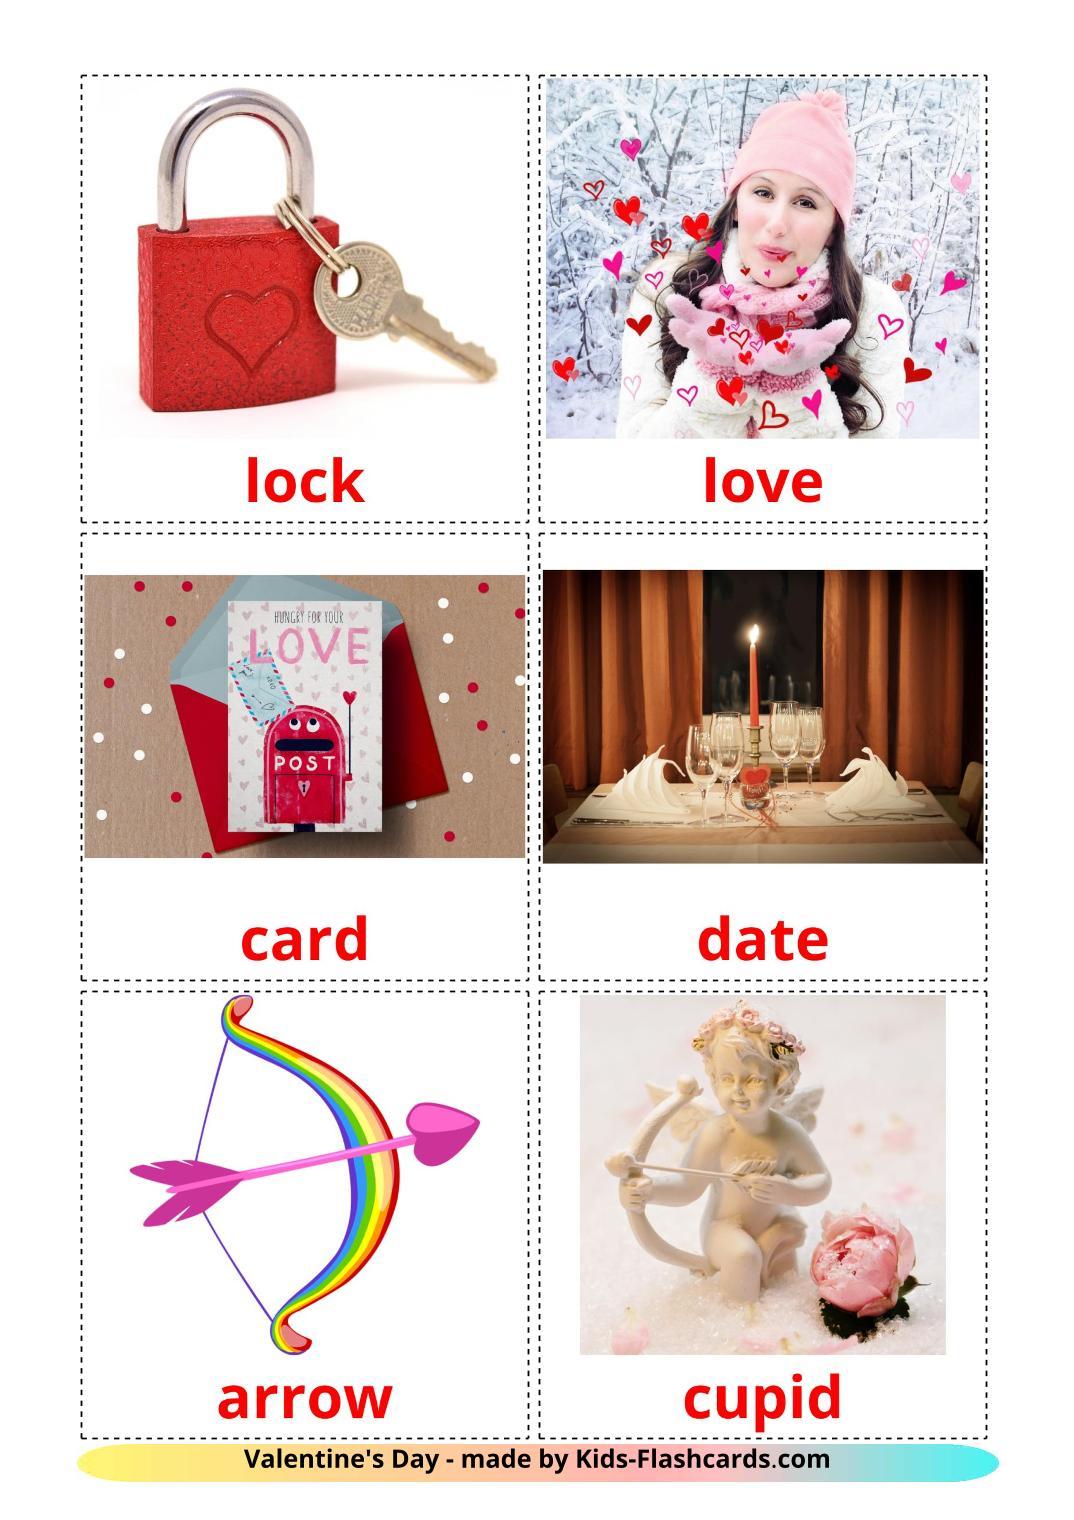 Valentine's Day - 18 Free Printable english Flashcards